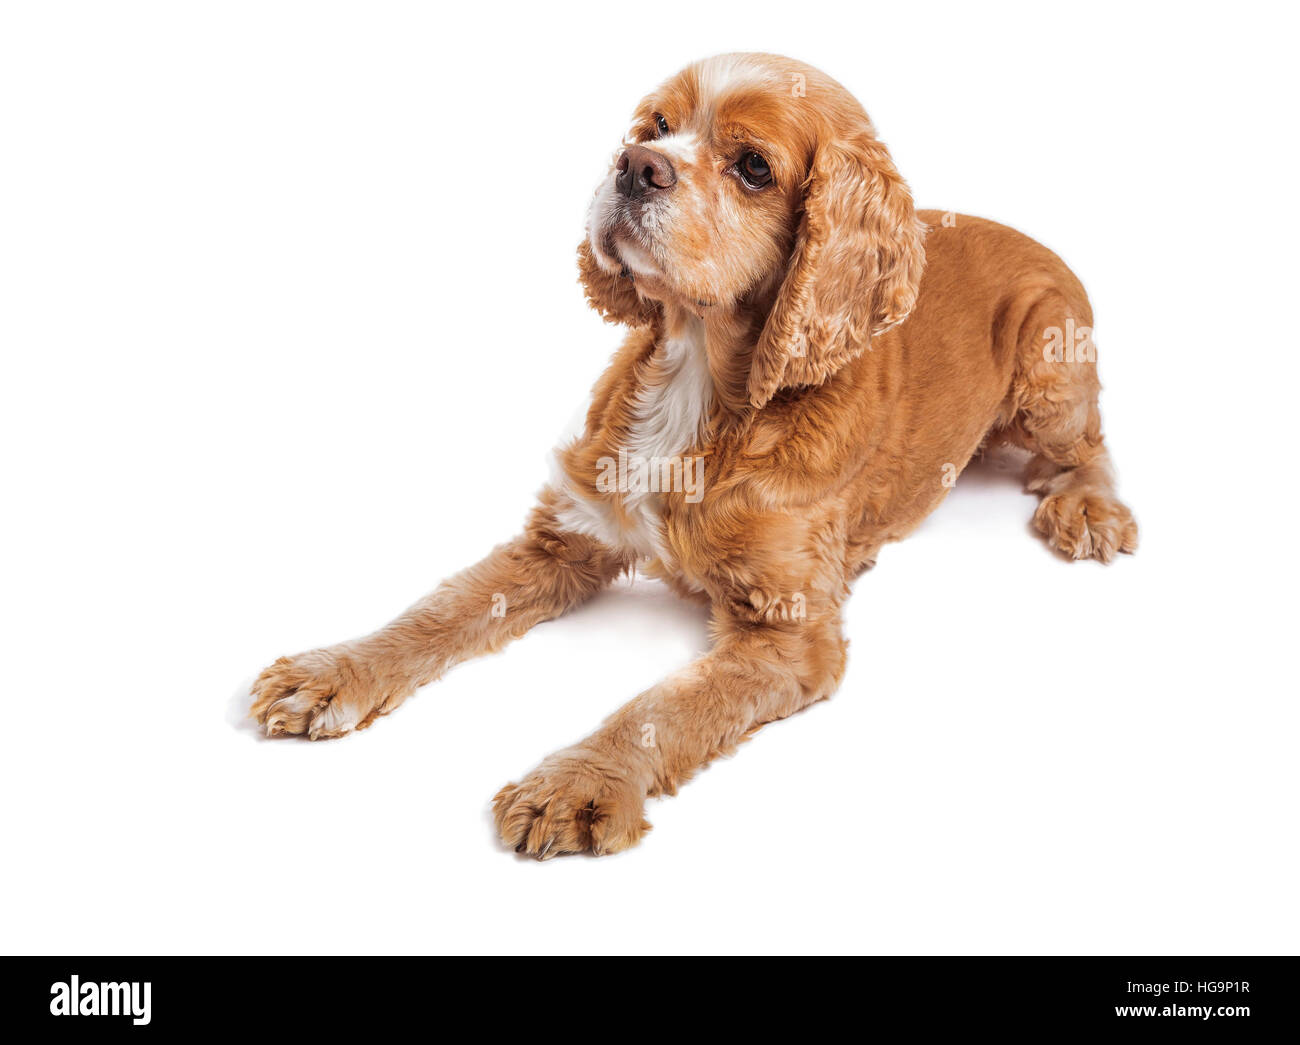 Cocker spaniel dog portrait on white. - Stock Image